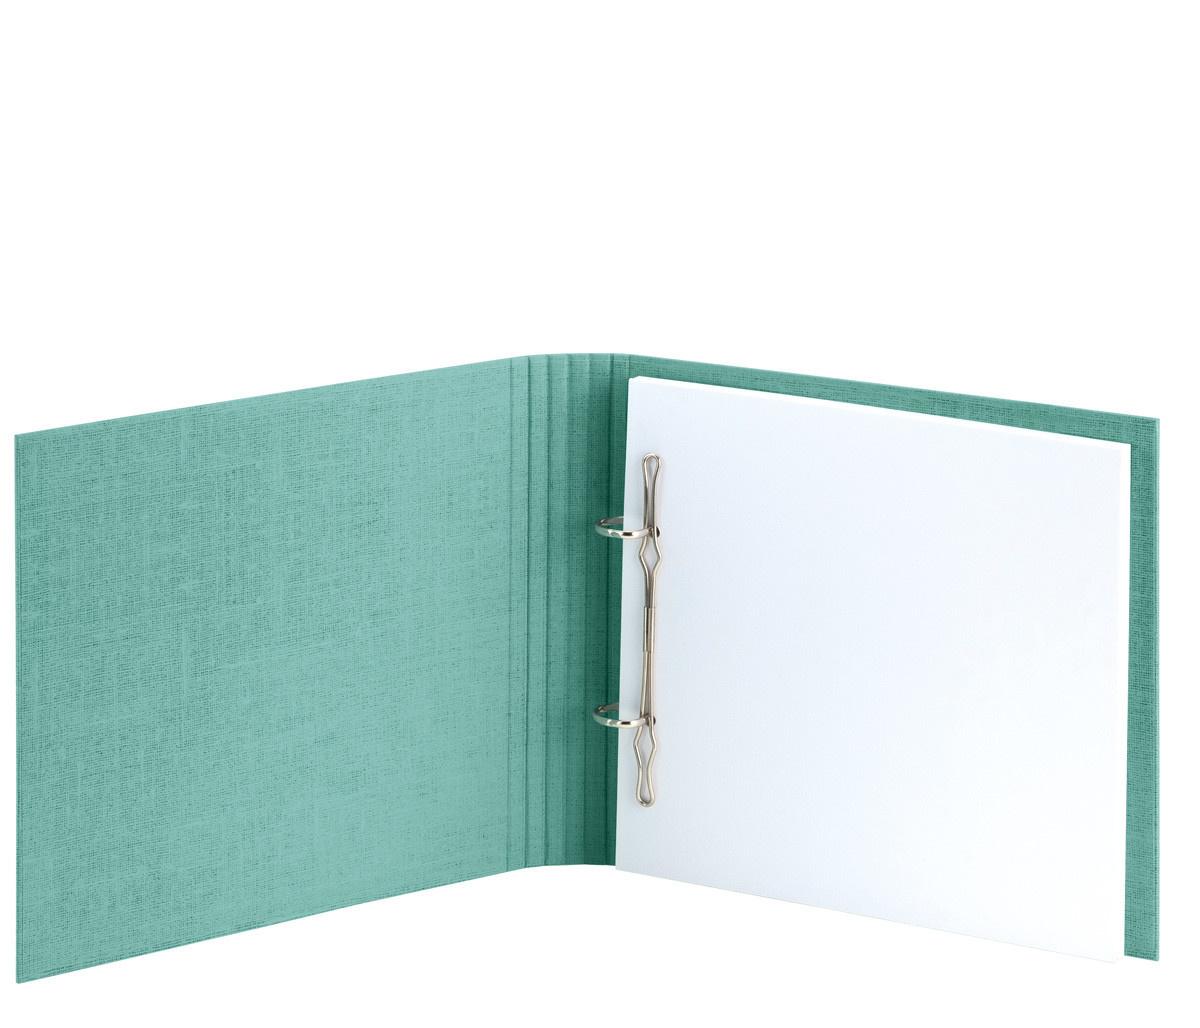 Rössler Picture album green - 50 pages 230 x 210 mm 'memories'